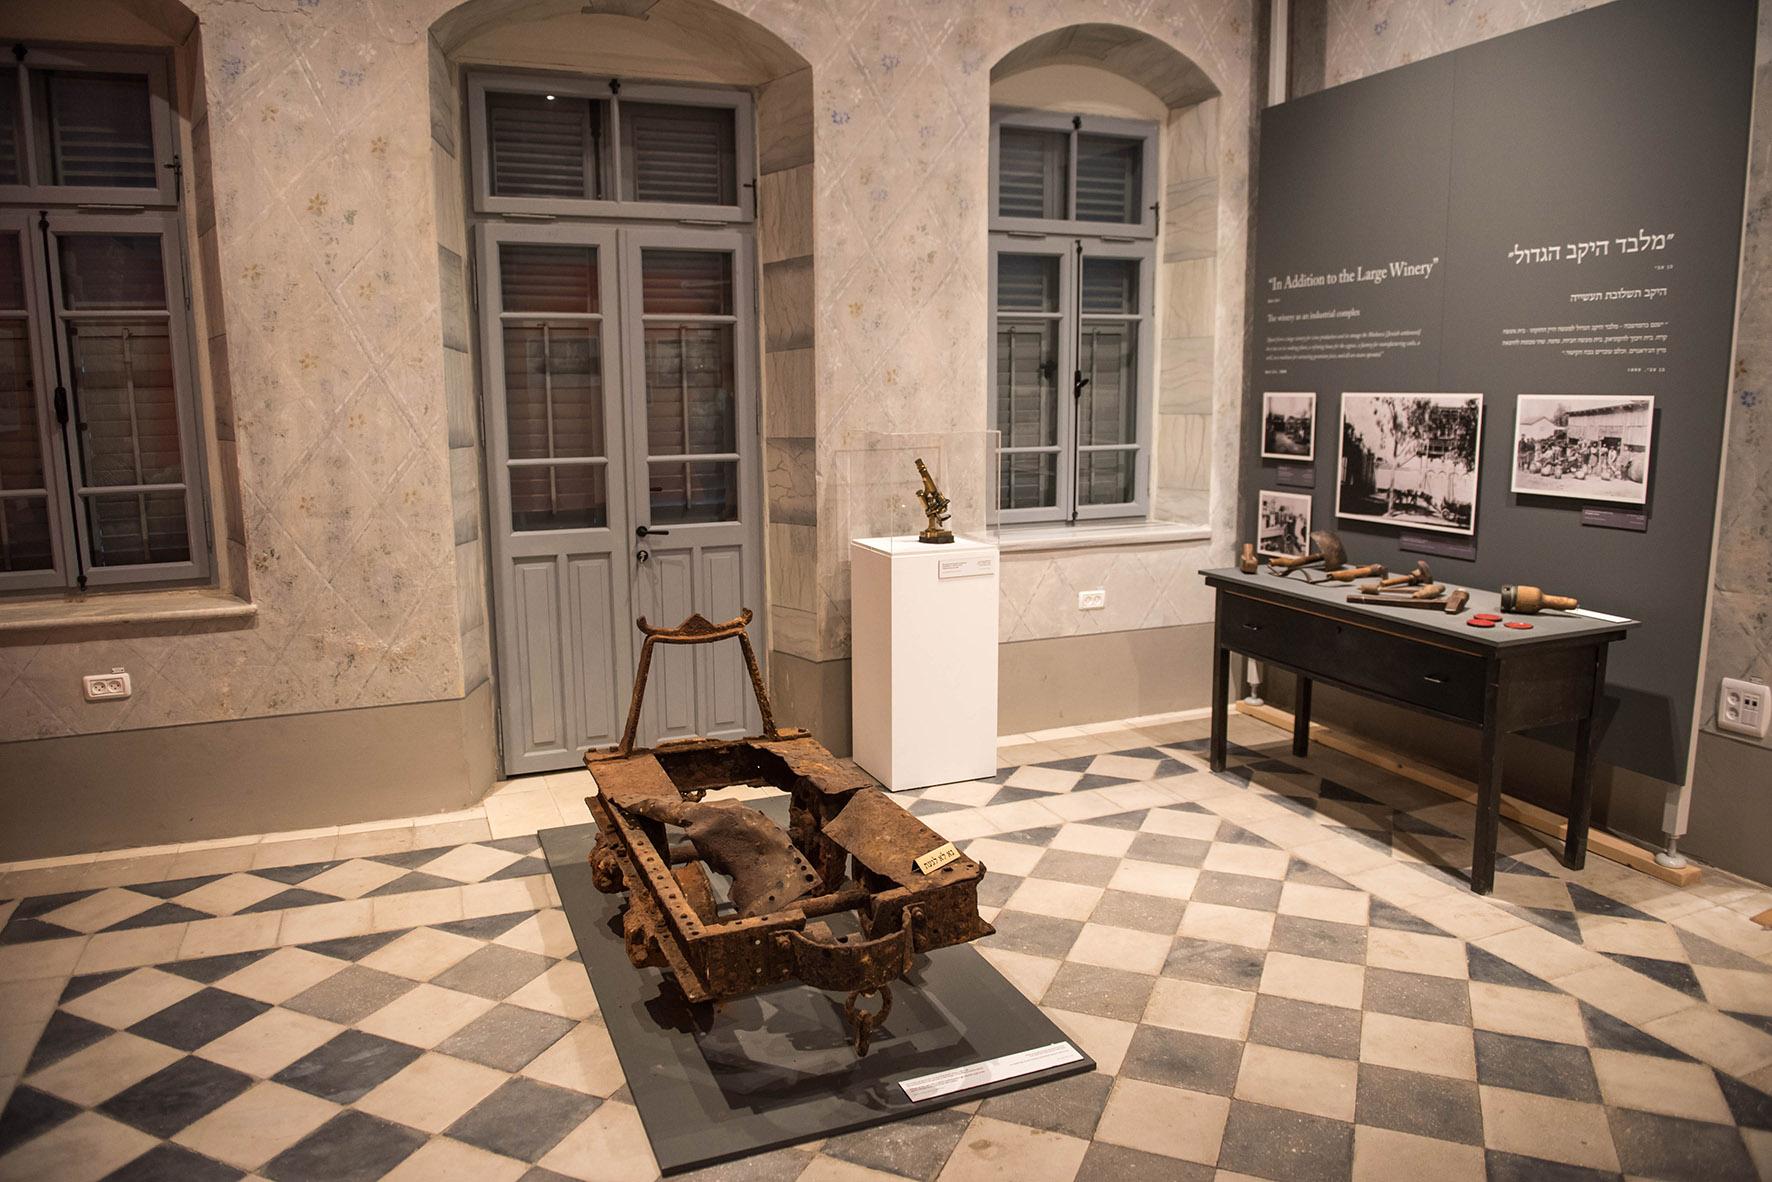 Photo of כבוד למוזיאון ראשון לציון:ארכיון המוזיאון יעבור תהליך דיגיטציהויוצג בספריה הלאומית של ישראל